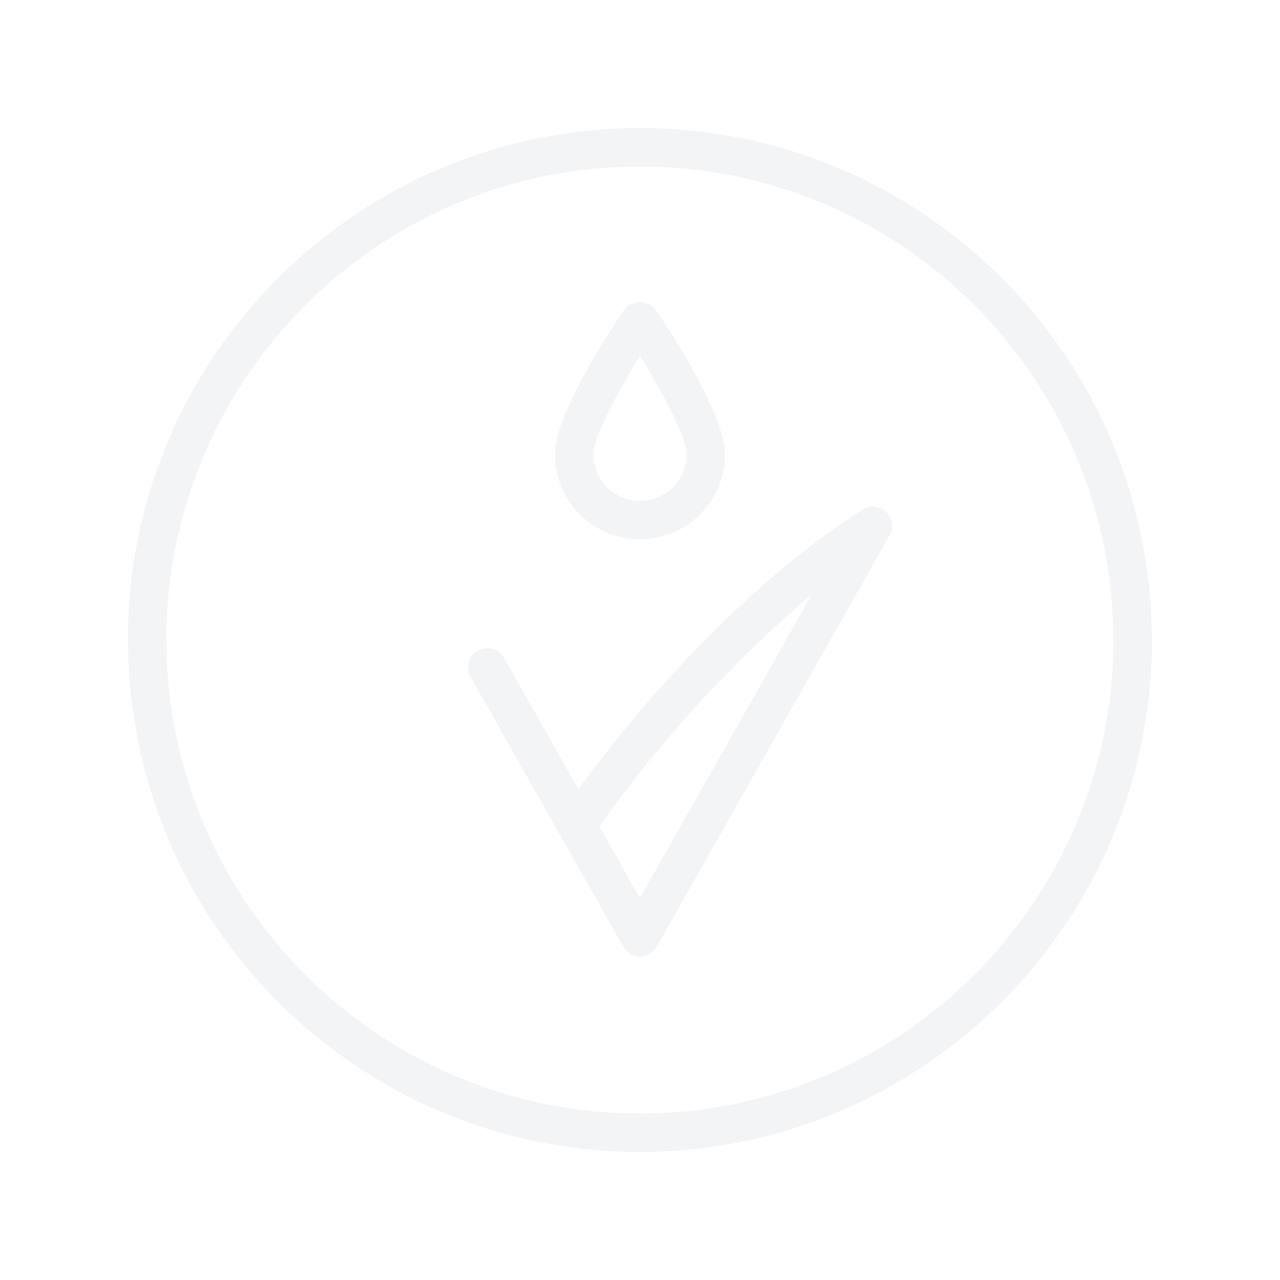 GOSH Blending Brush Gift Set подарочный набор